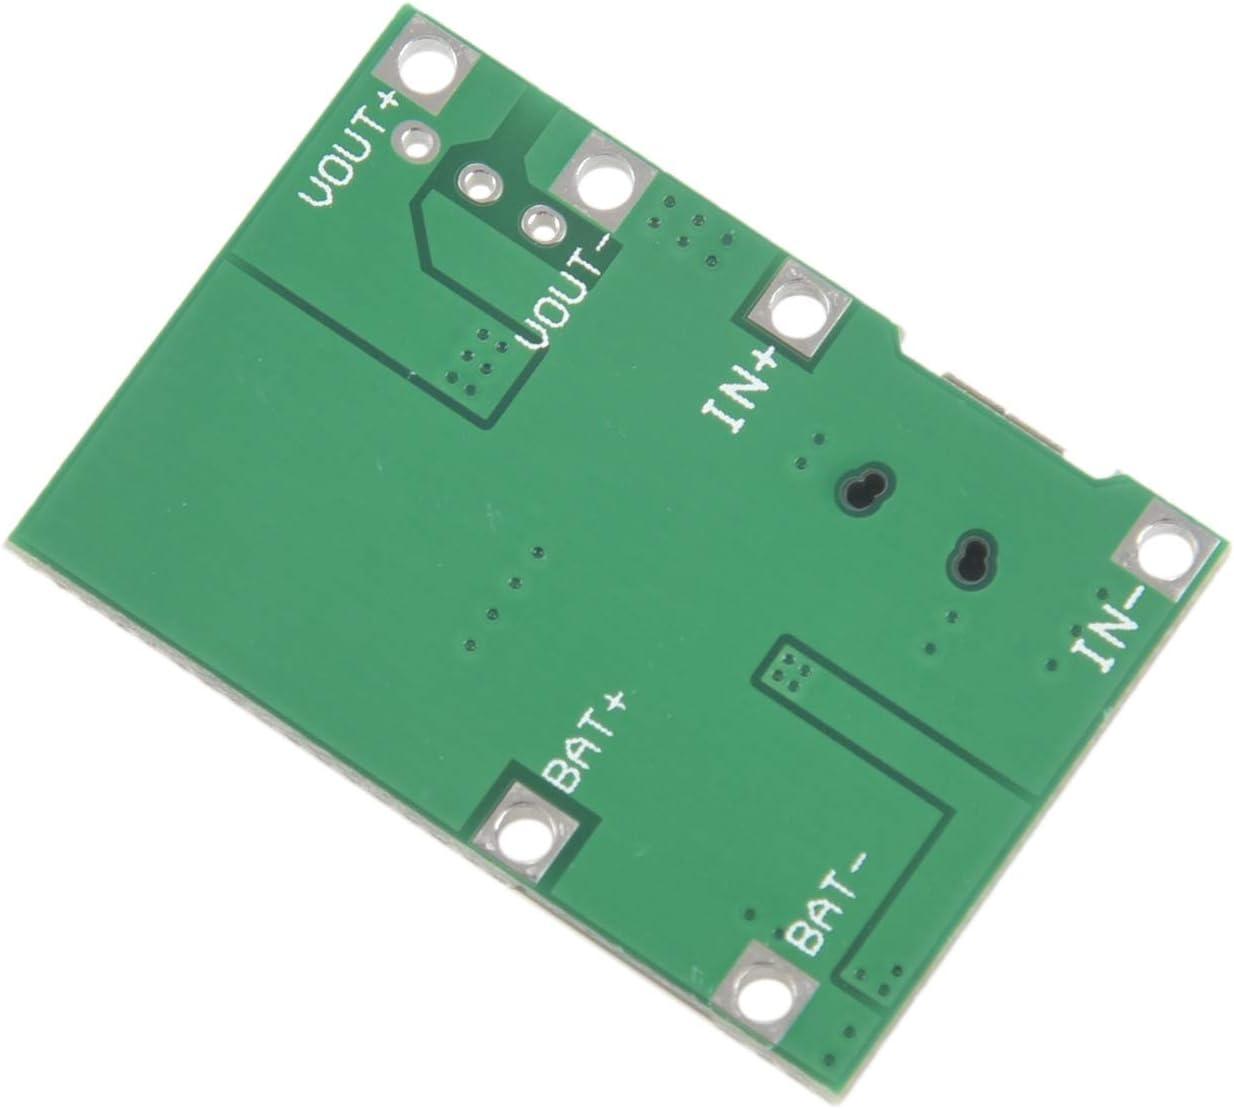 BKAUK 3.7V 9V 5V 2A Modulo Integrato di Ricarica per Batterie al Litio Step Up 18650 Regolabile